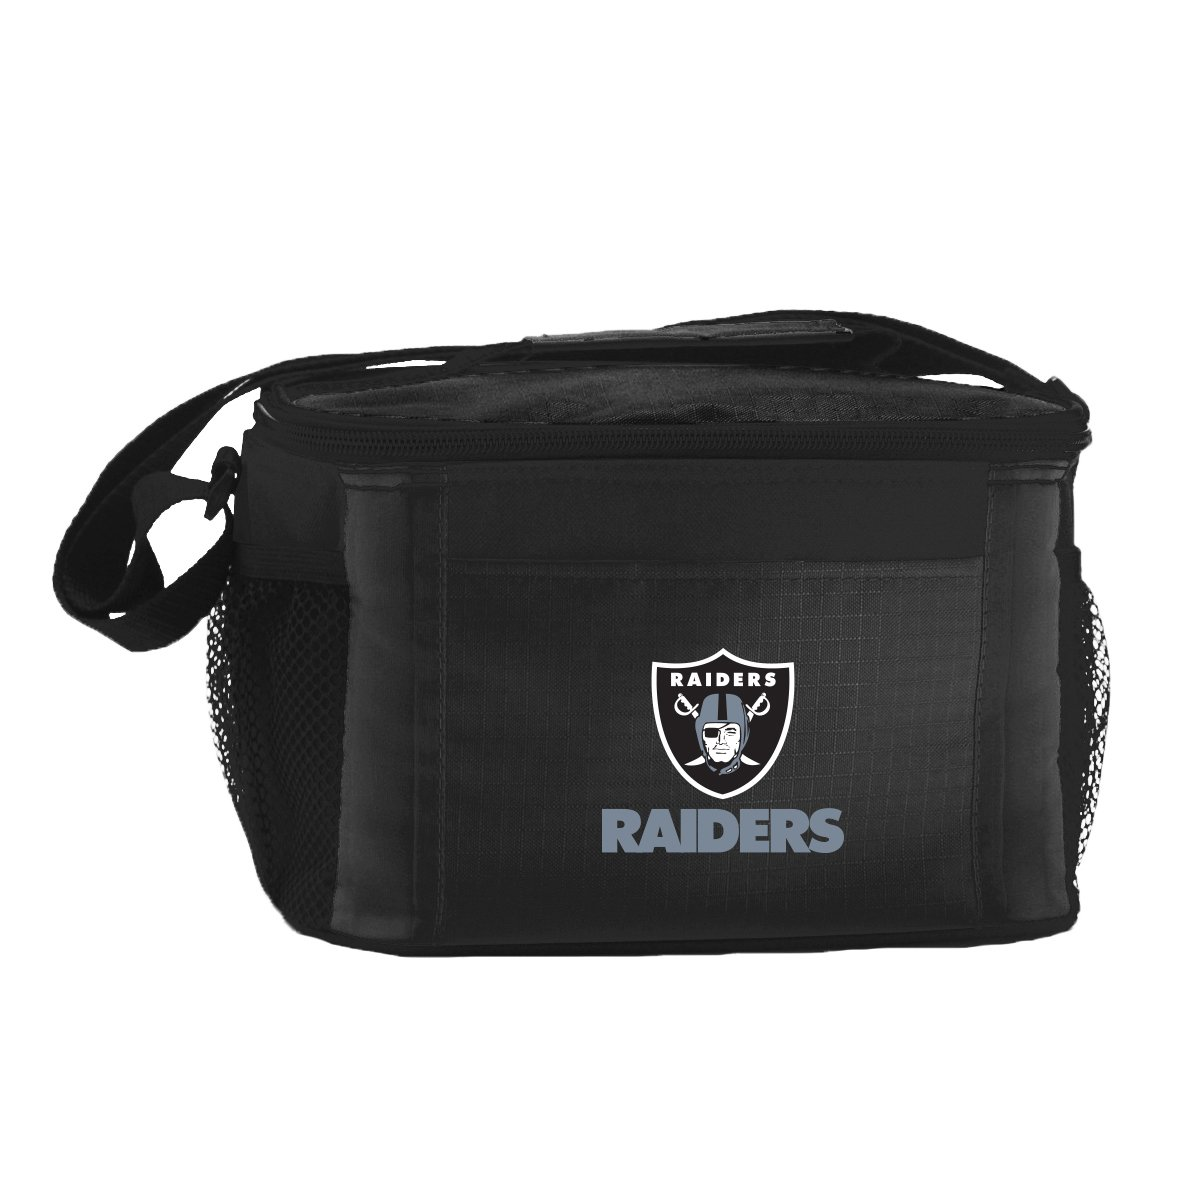 Kolder NFL Oakland Raiders Insulated Lunch Cooler Bag with Zipper Closure, Black 086867899001